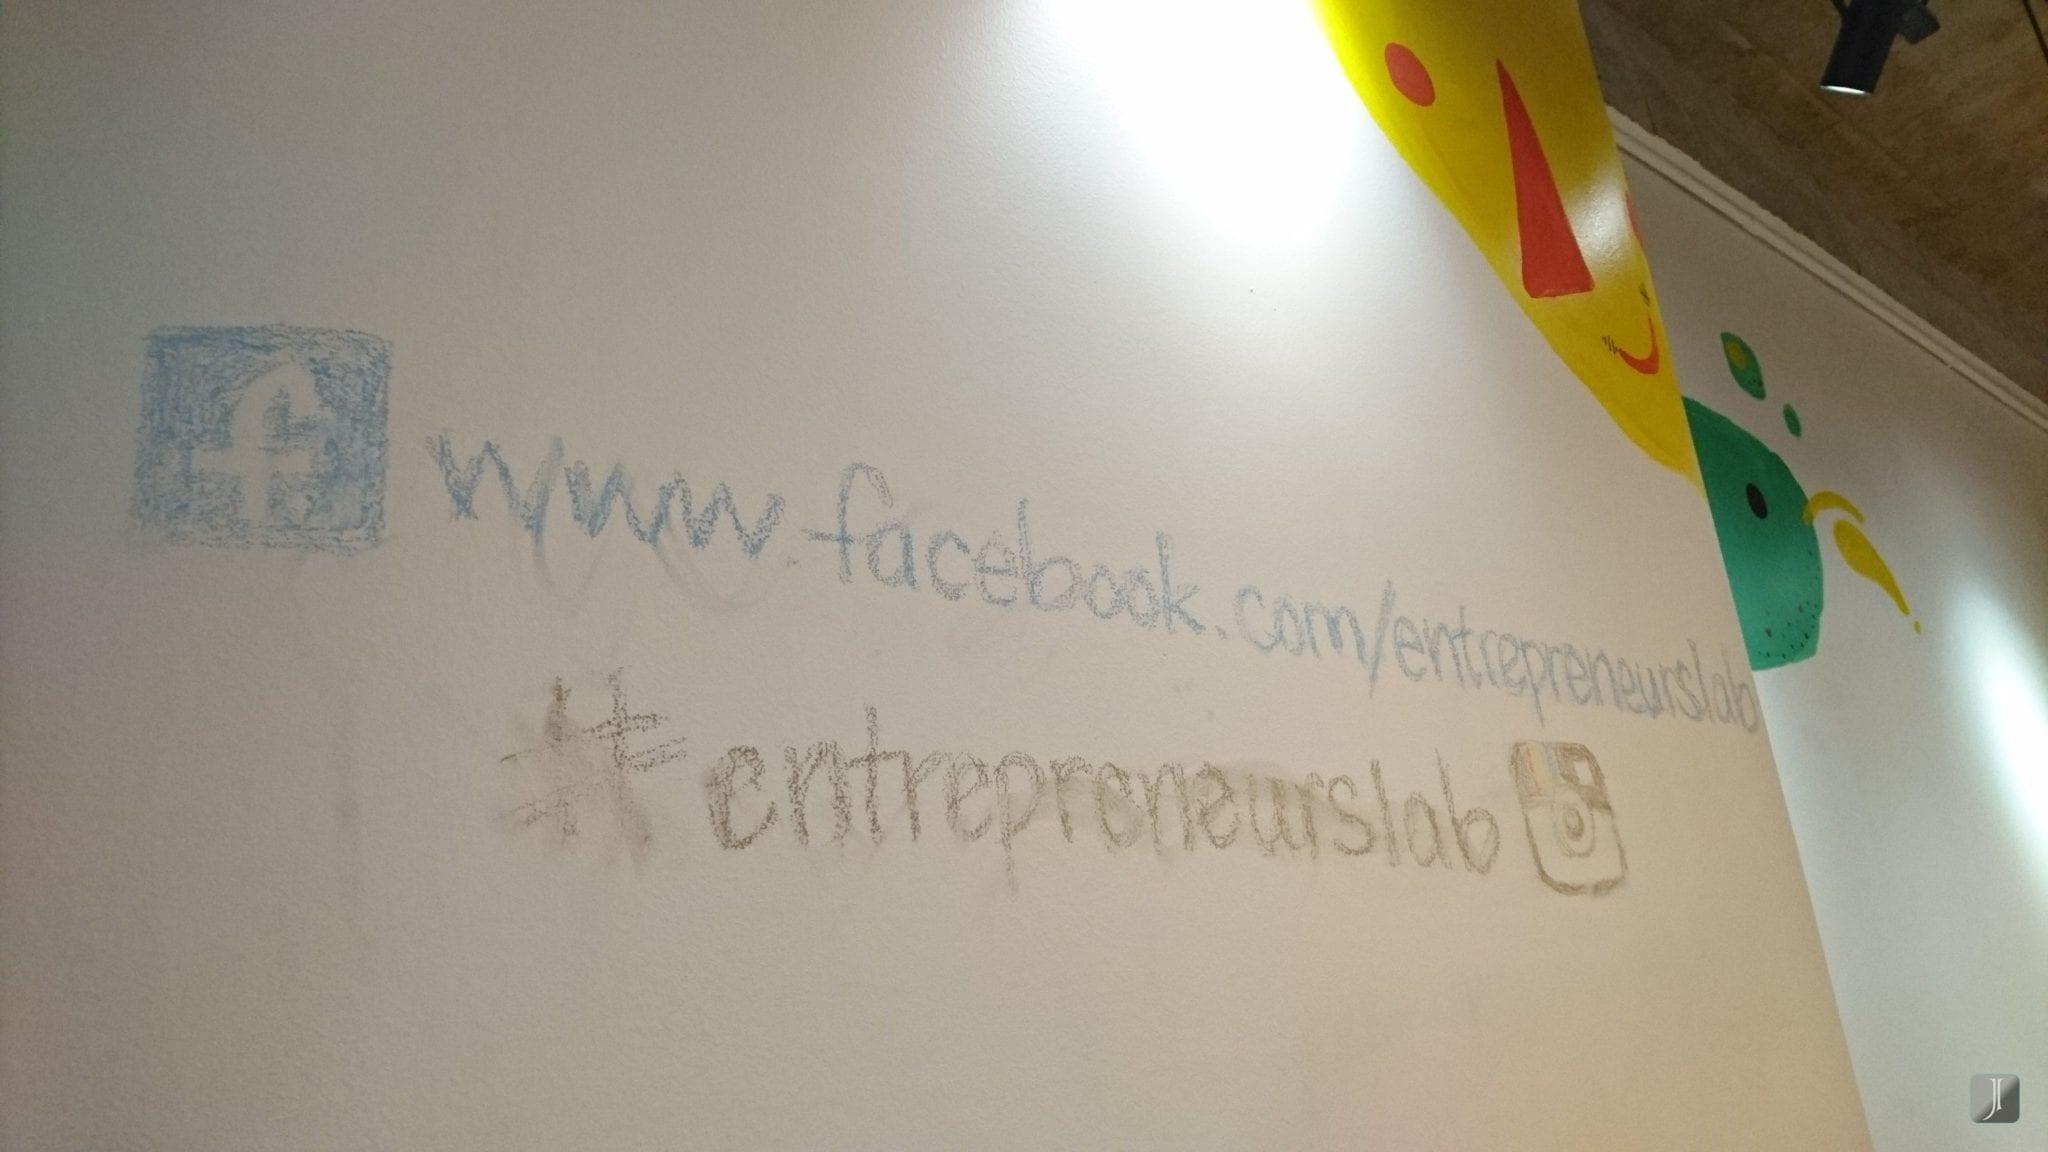 The Entrepreneurs' Lab - visit by Jay Chong (26)